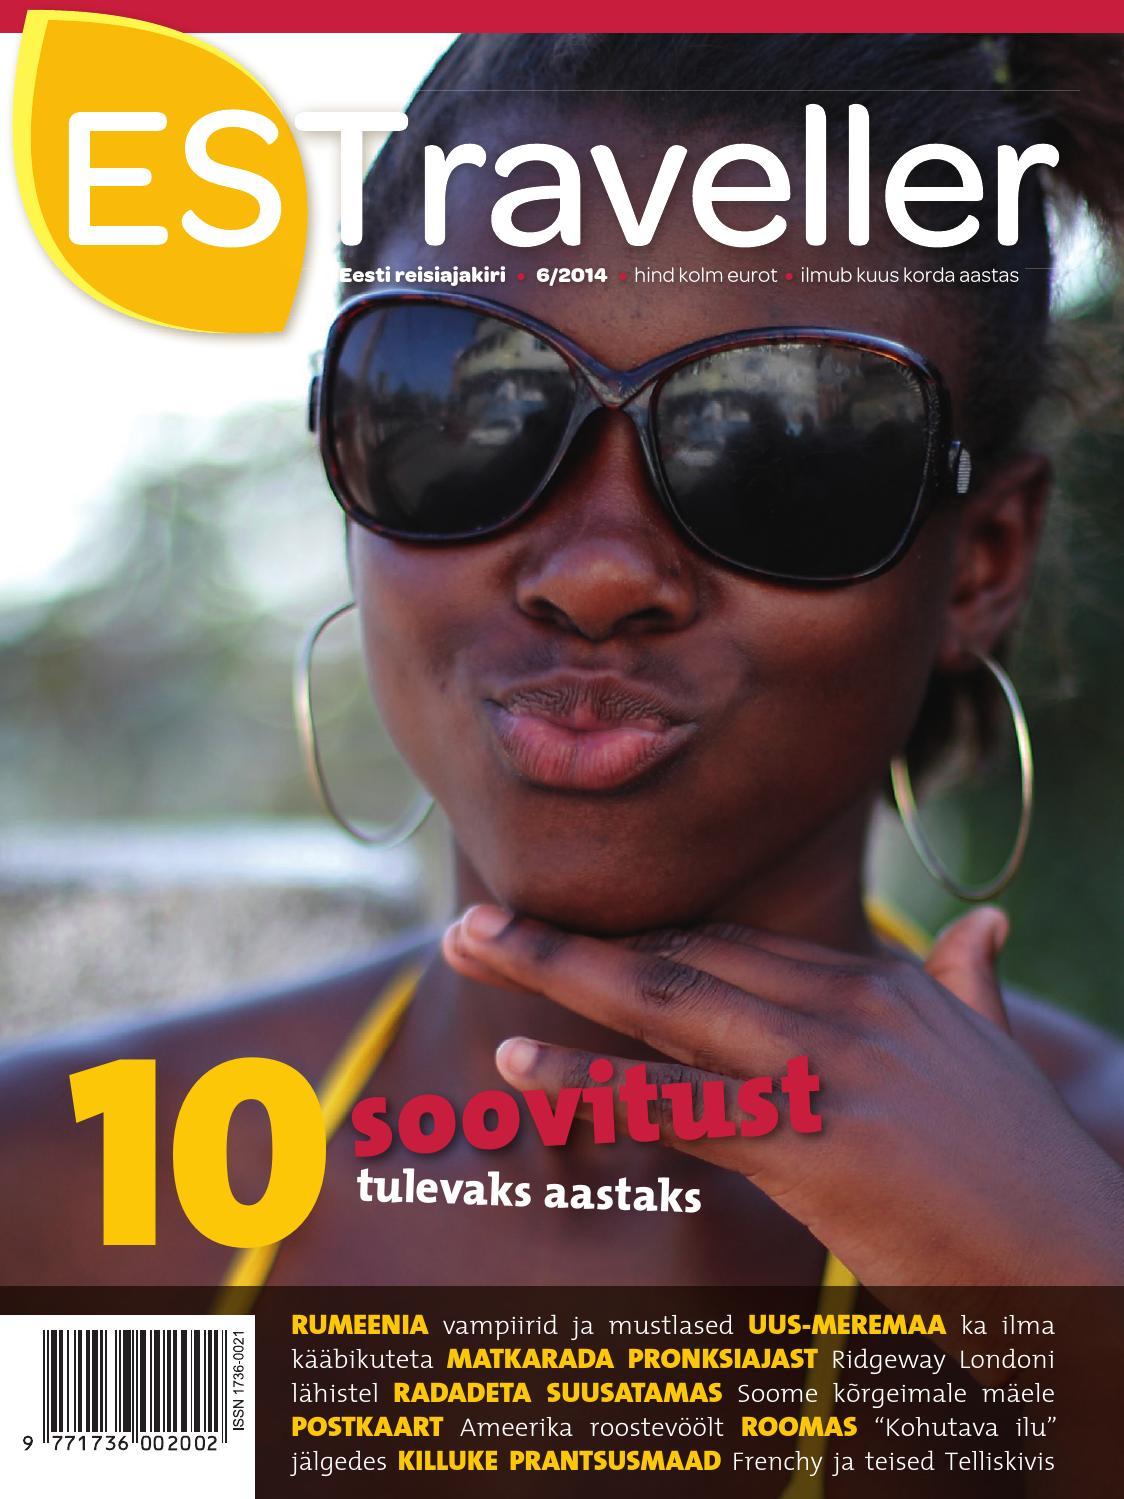 f1bd5bfe6e6 Estraveller 6 2014 by Estraveller - issuu